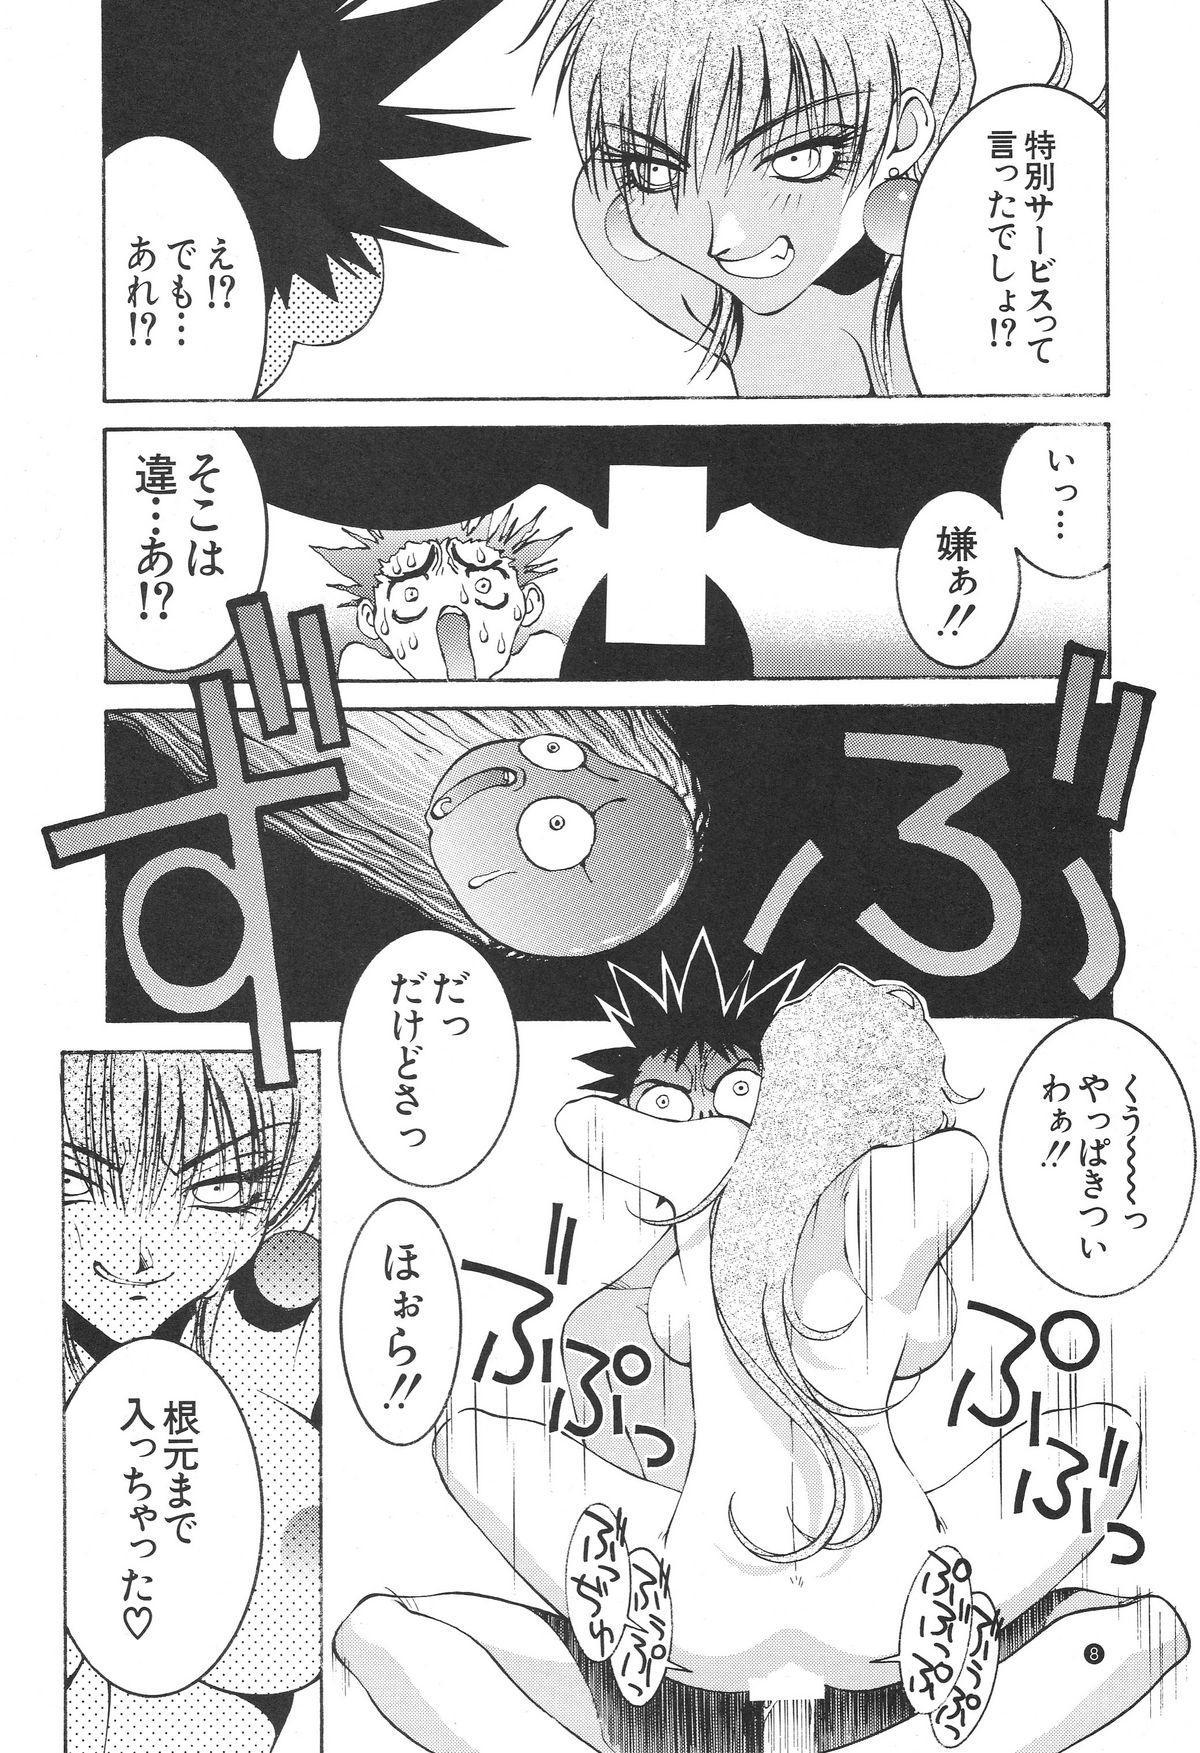 Nori-Haru 8